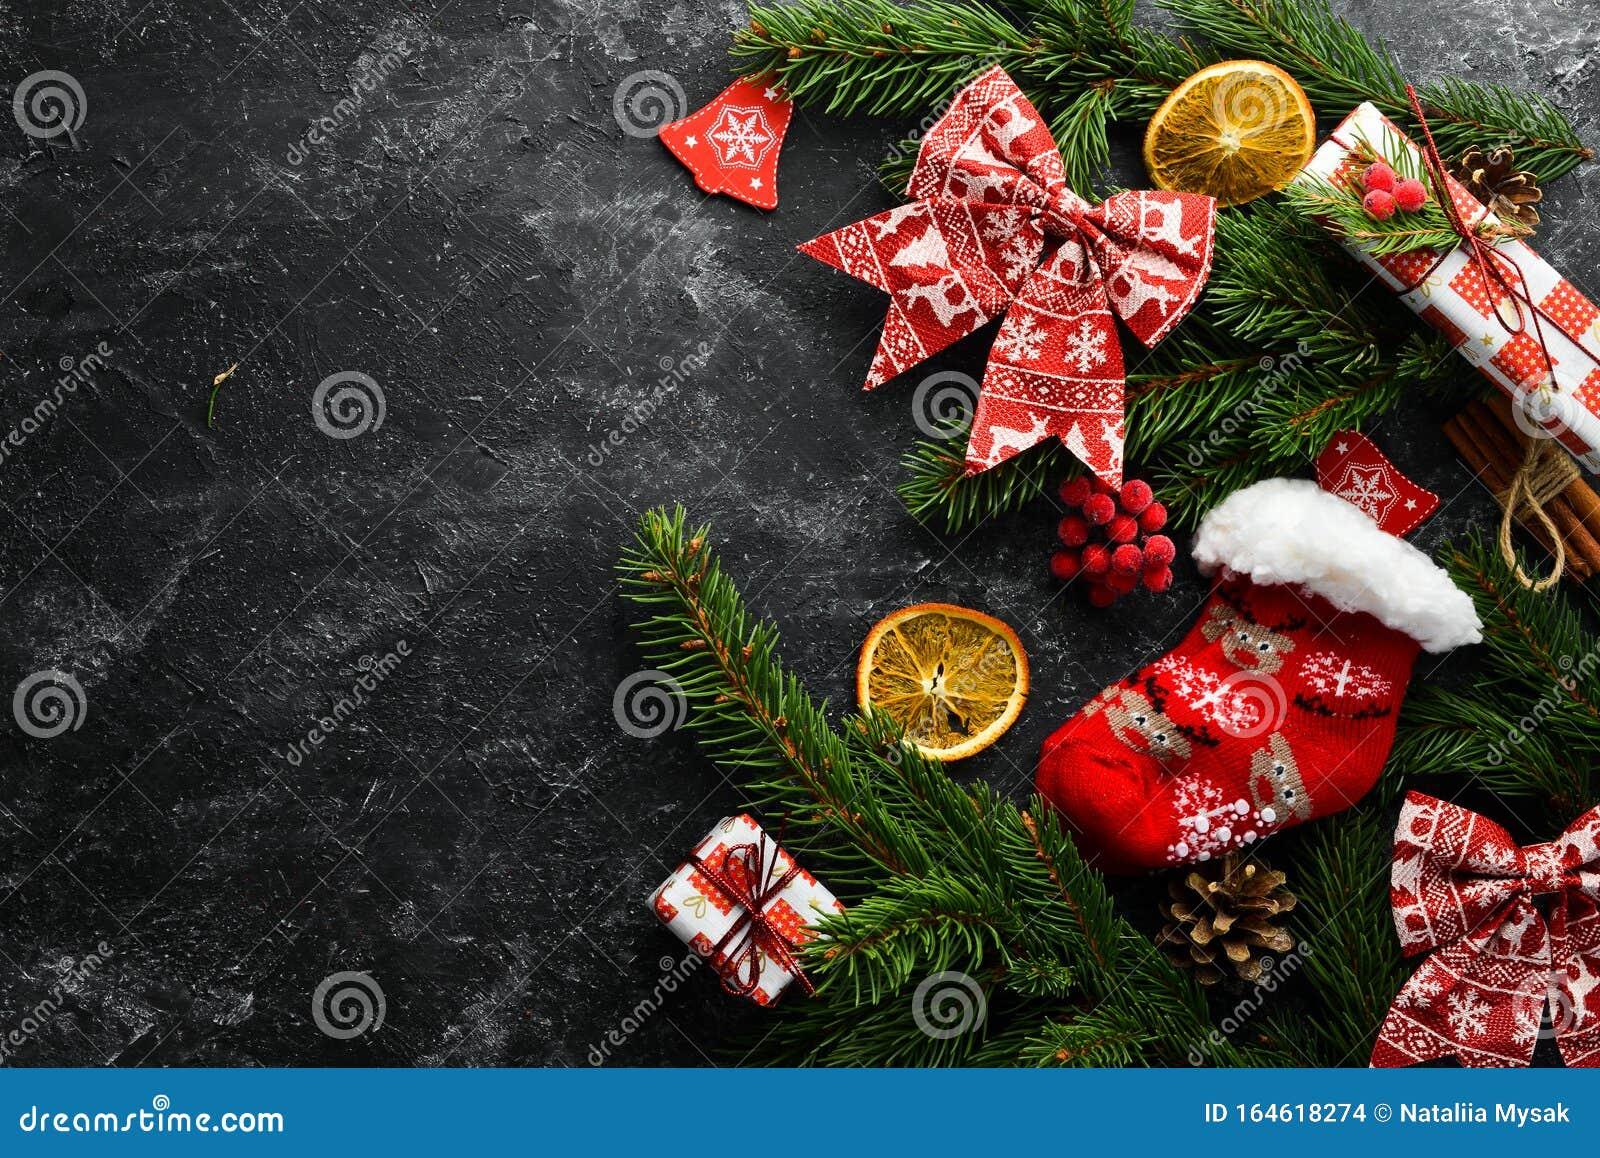 Christmas warm socks and scenery.